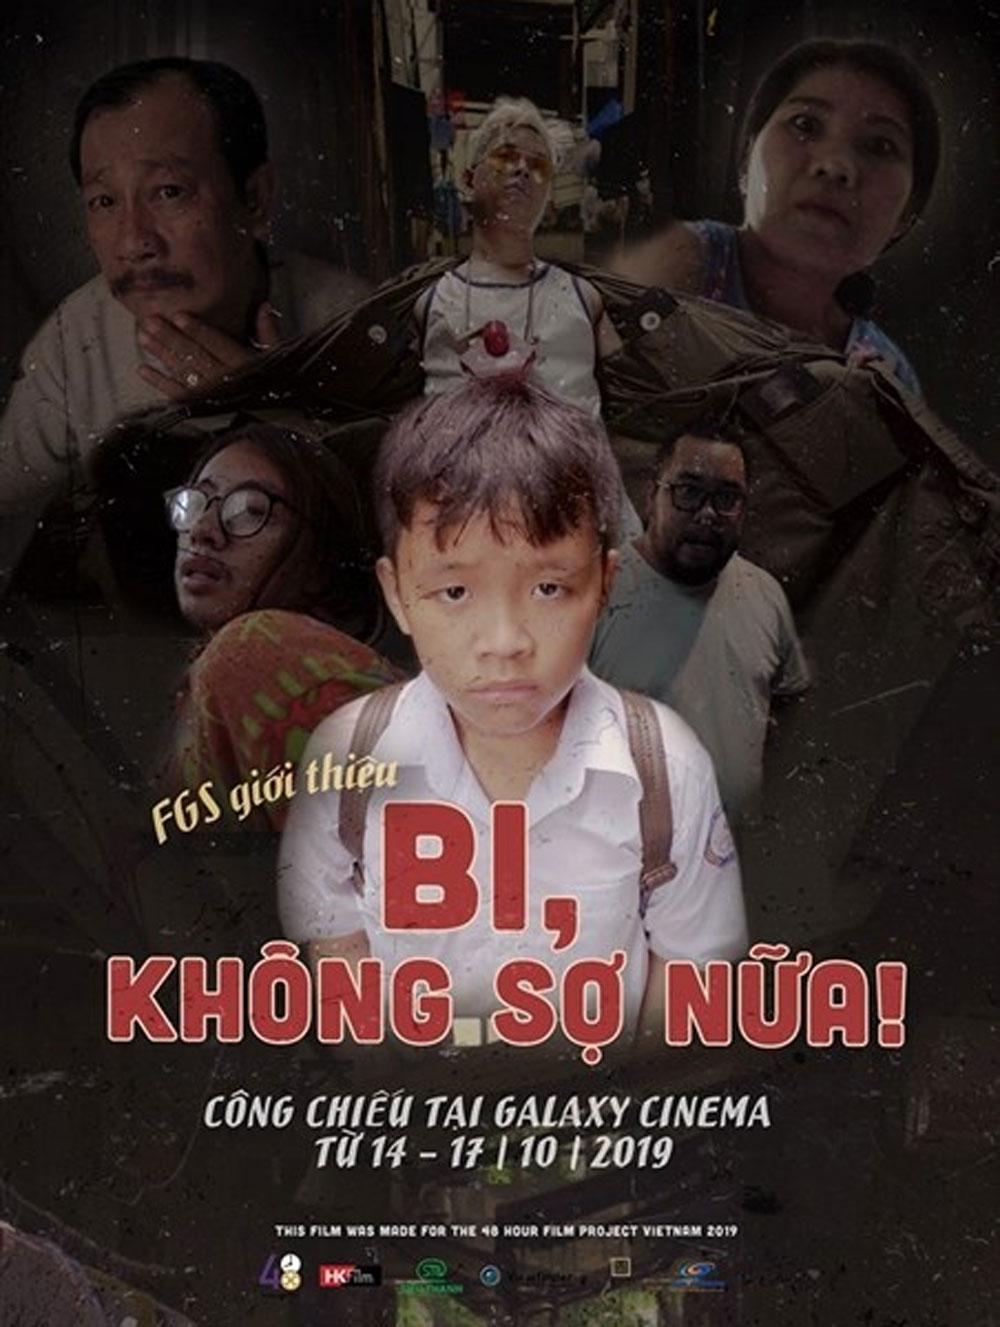 Short Vietnamese film, Netherlands, Bi, Khong So Nua, Bi, No More Fear, video production,  highest prize, 48 Hour Film Project Vietnam